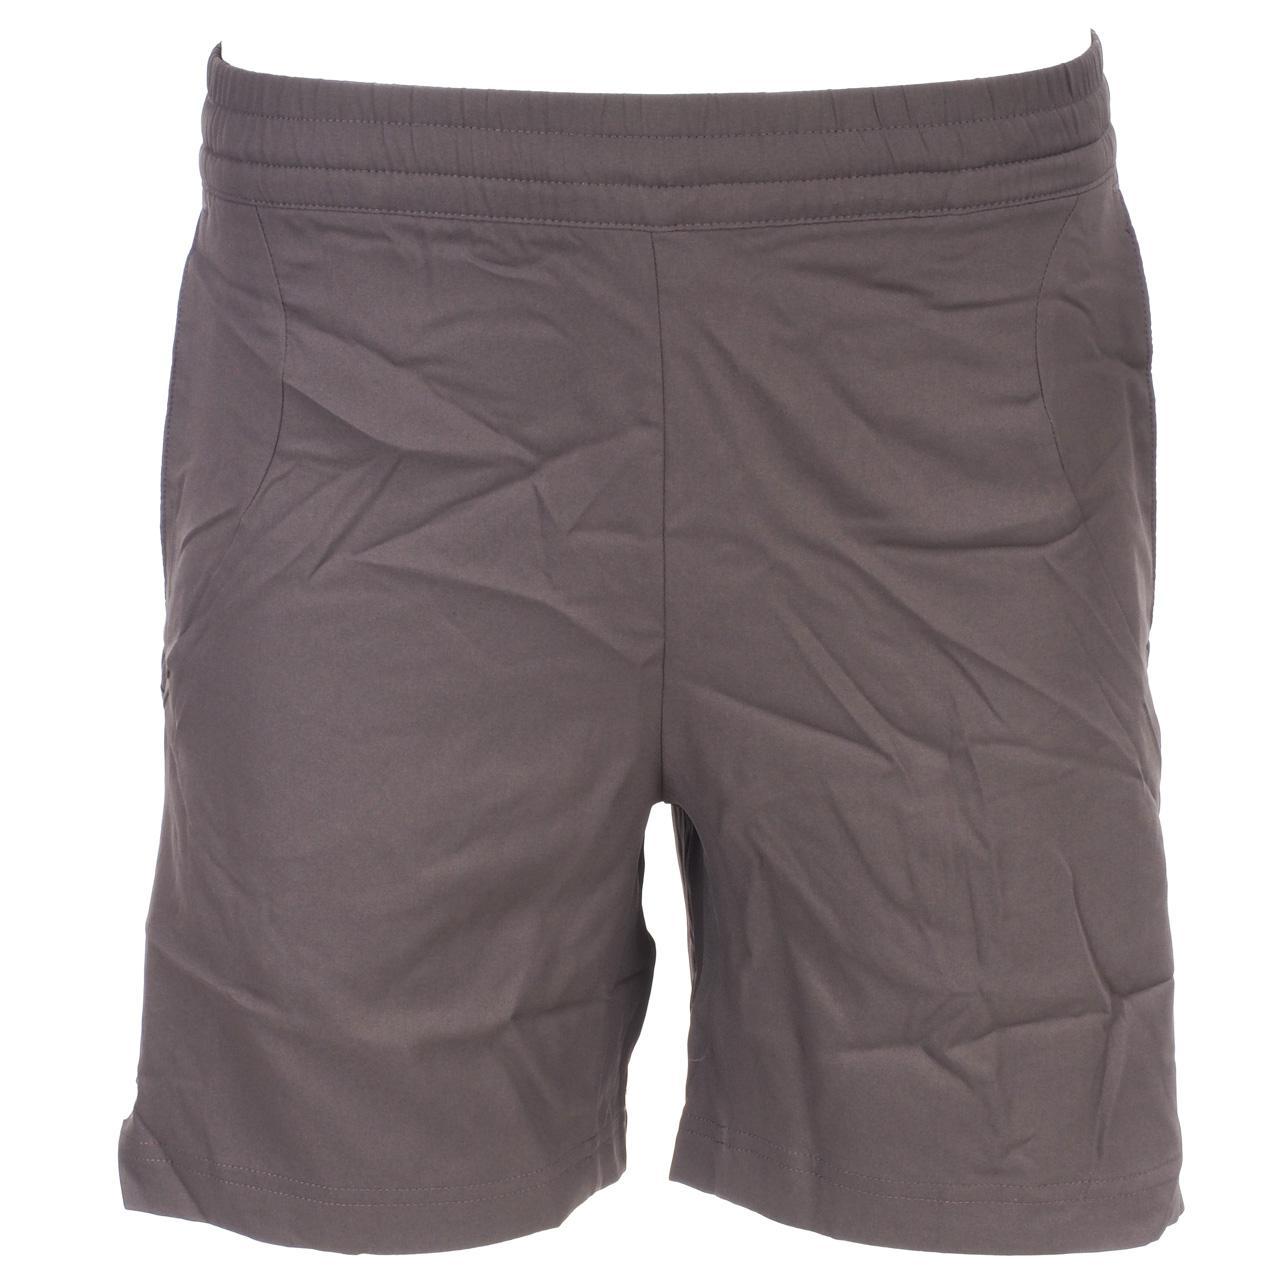 short-Tennis-Babolat-Shorts-Spiel-Core-Grau-Grau-70420-Neu